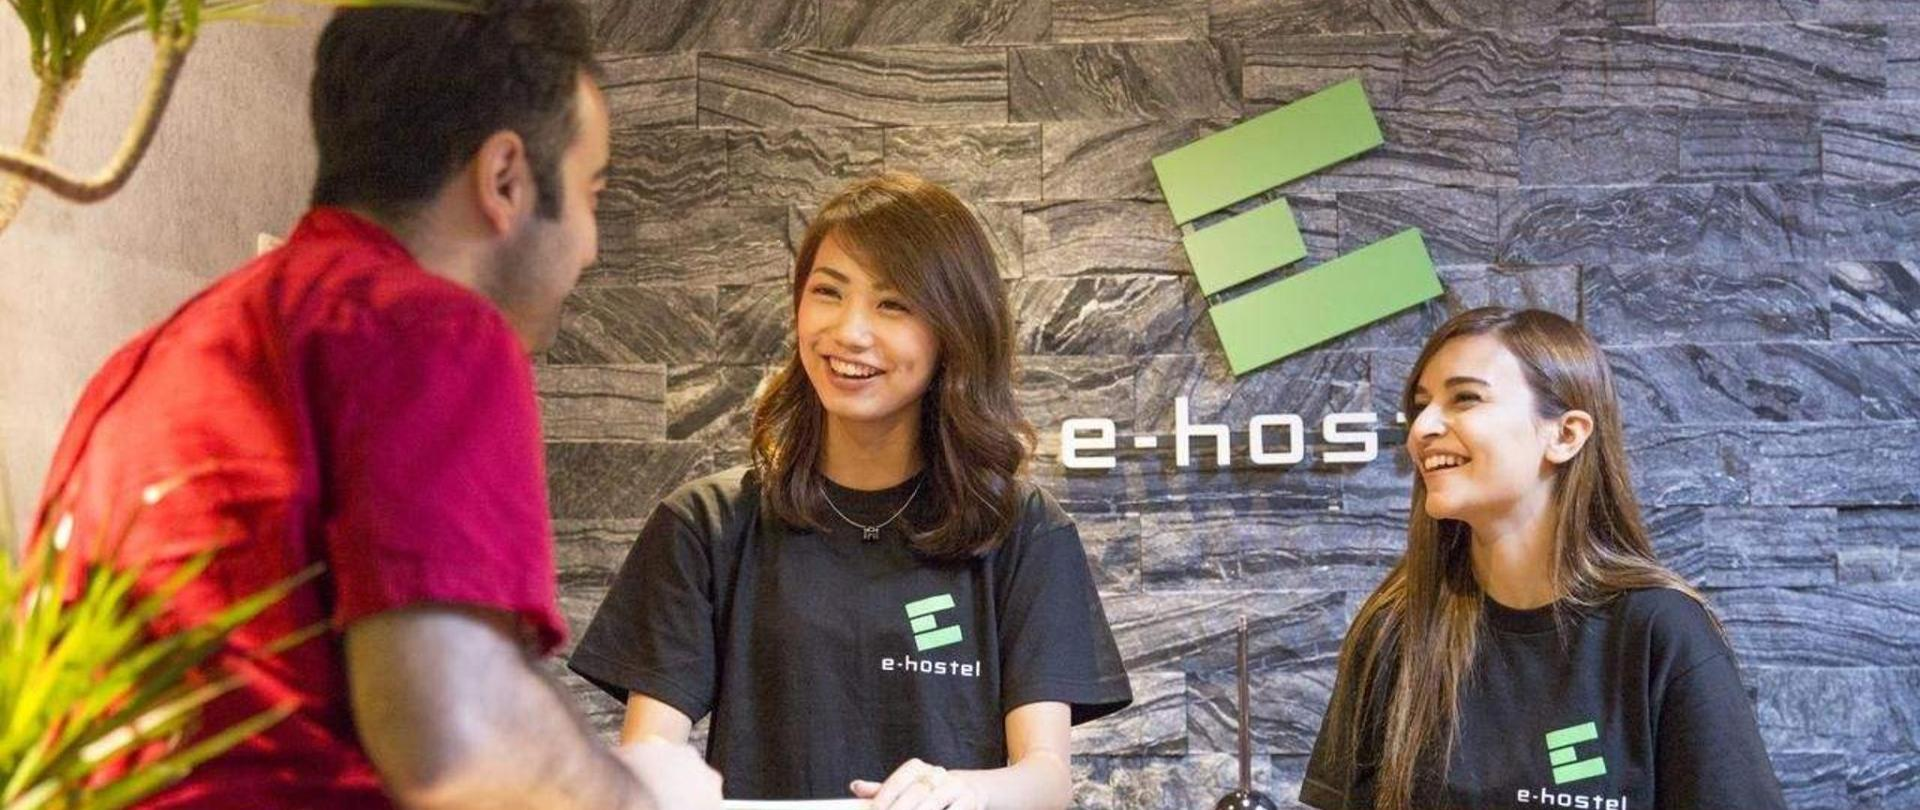 e-hostel 心斎橋